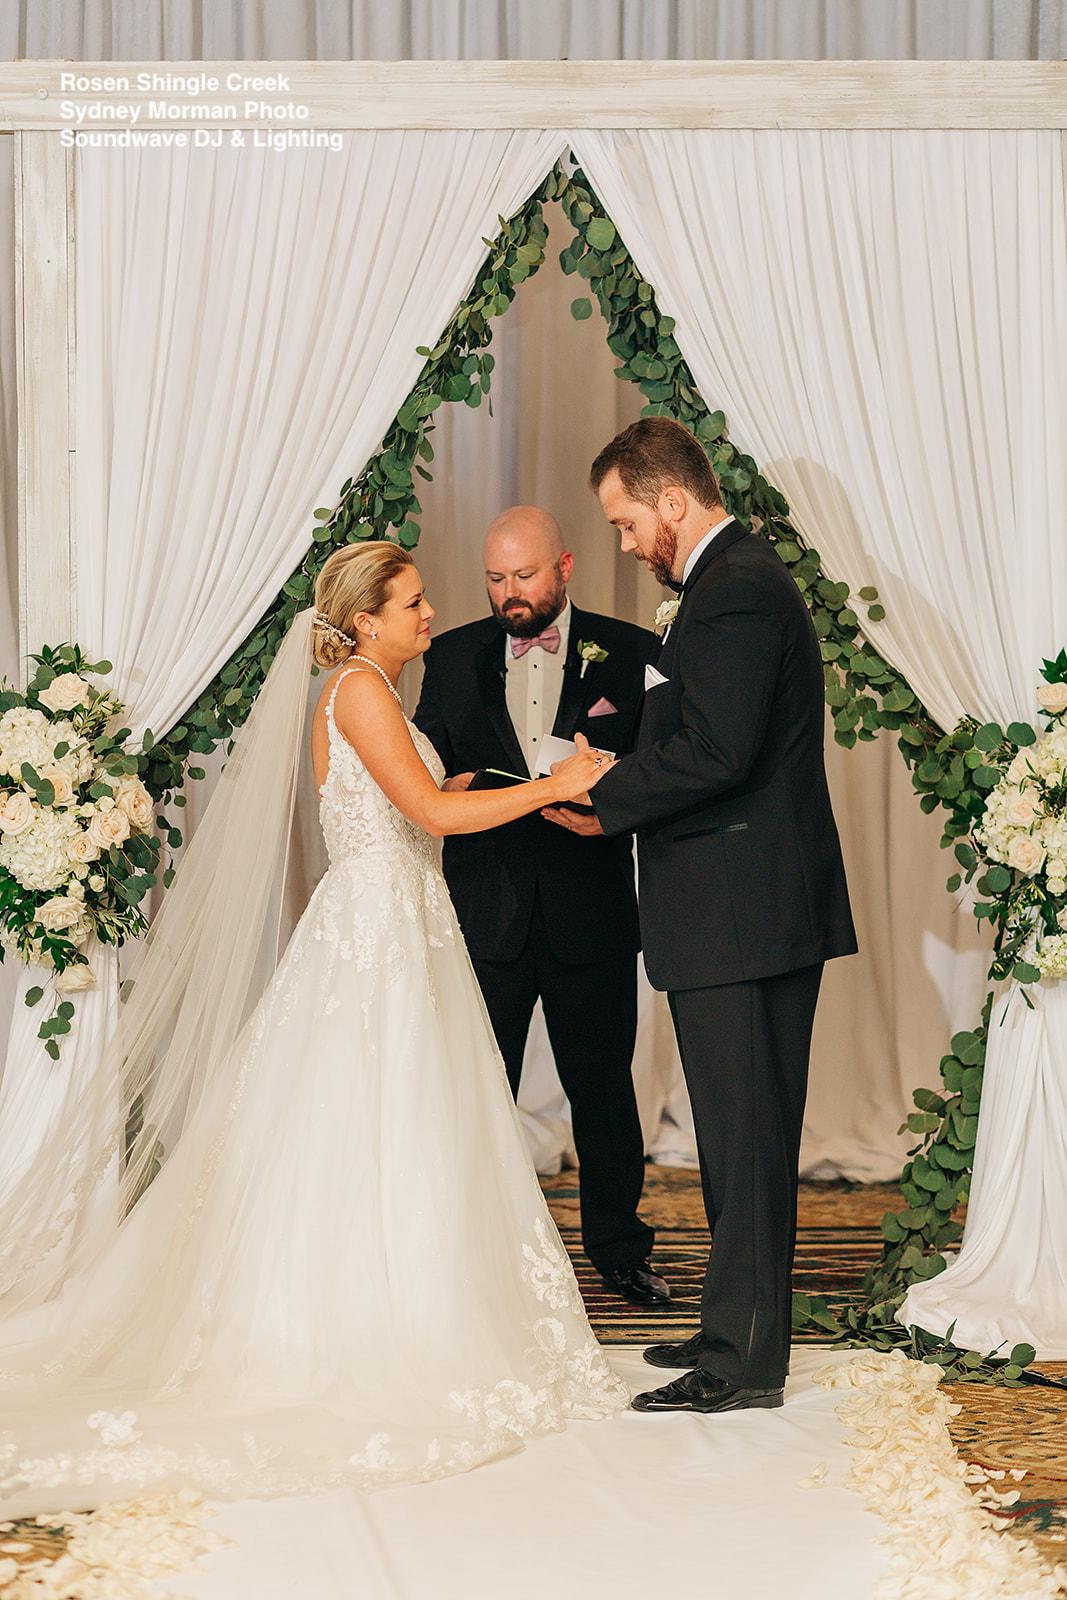 bride and groom vows wedding at rosen shingle creek soundwave entertainment